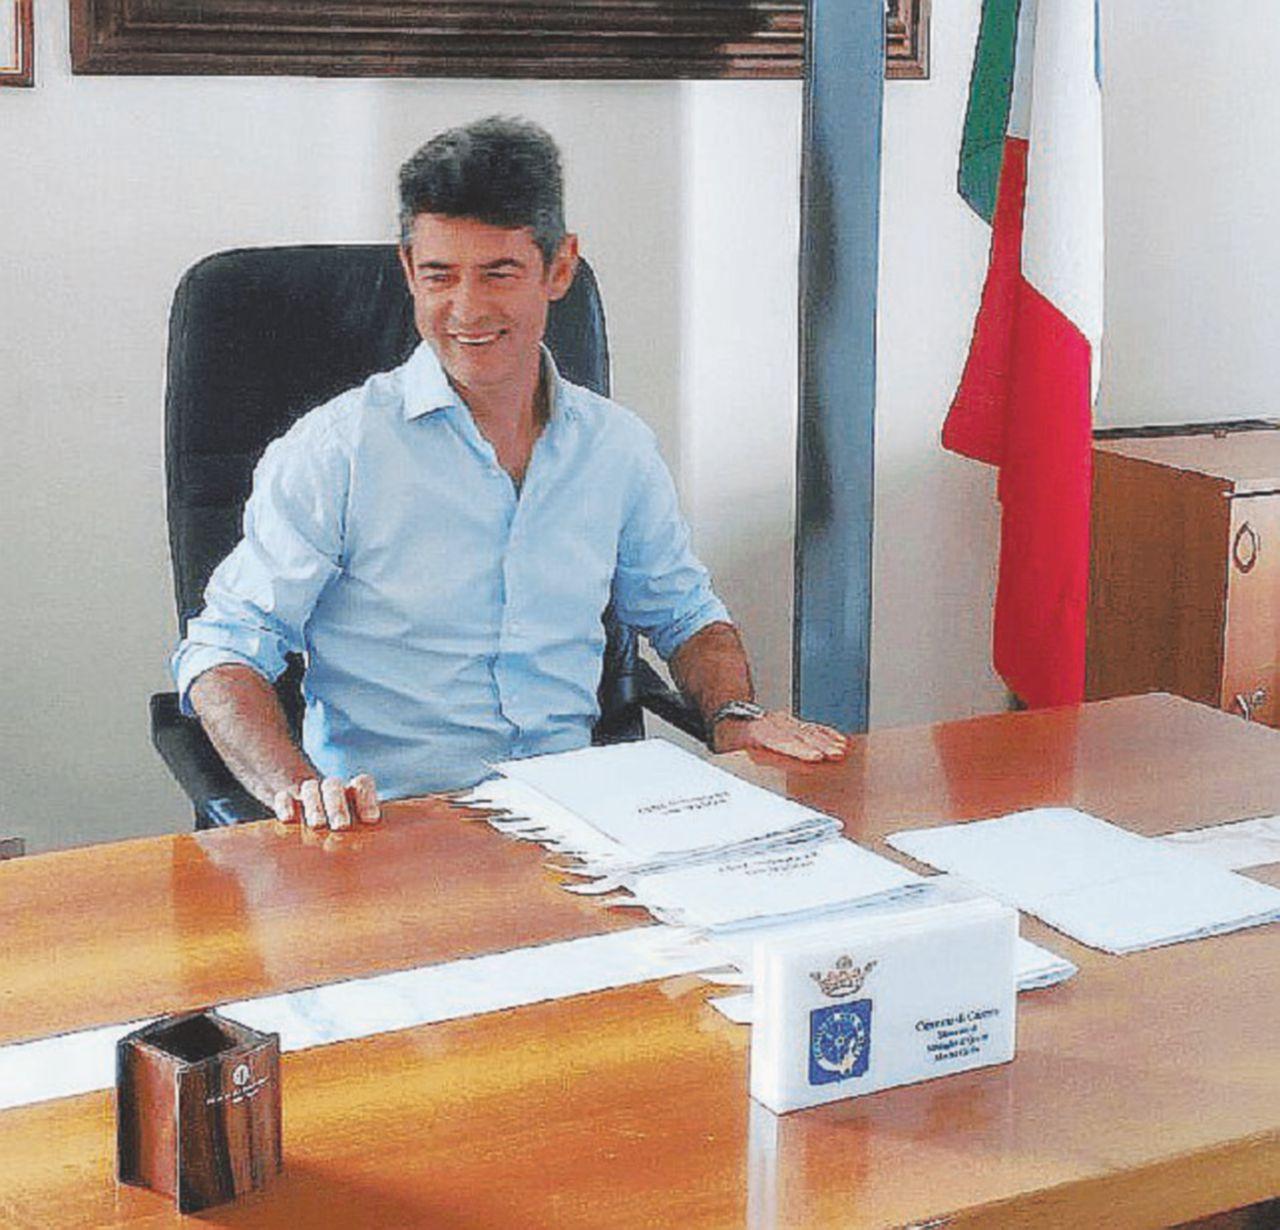 Massa-Carrara: Lega respinge, M5S accoglie